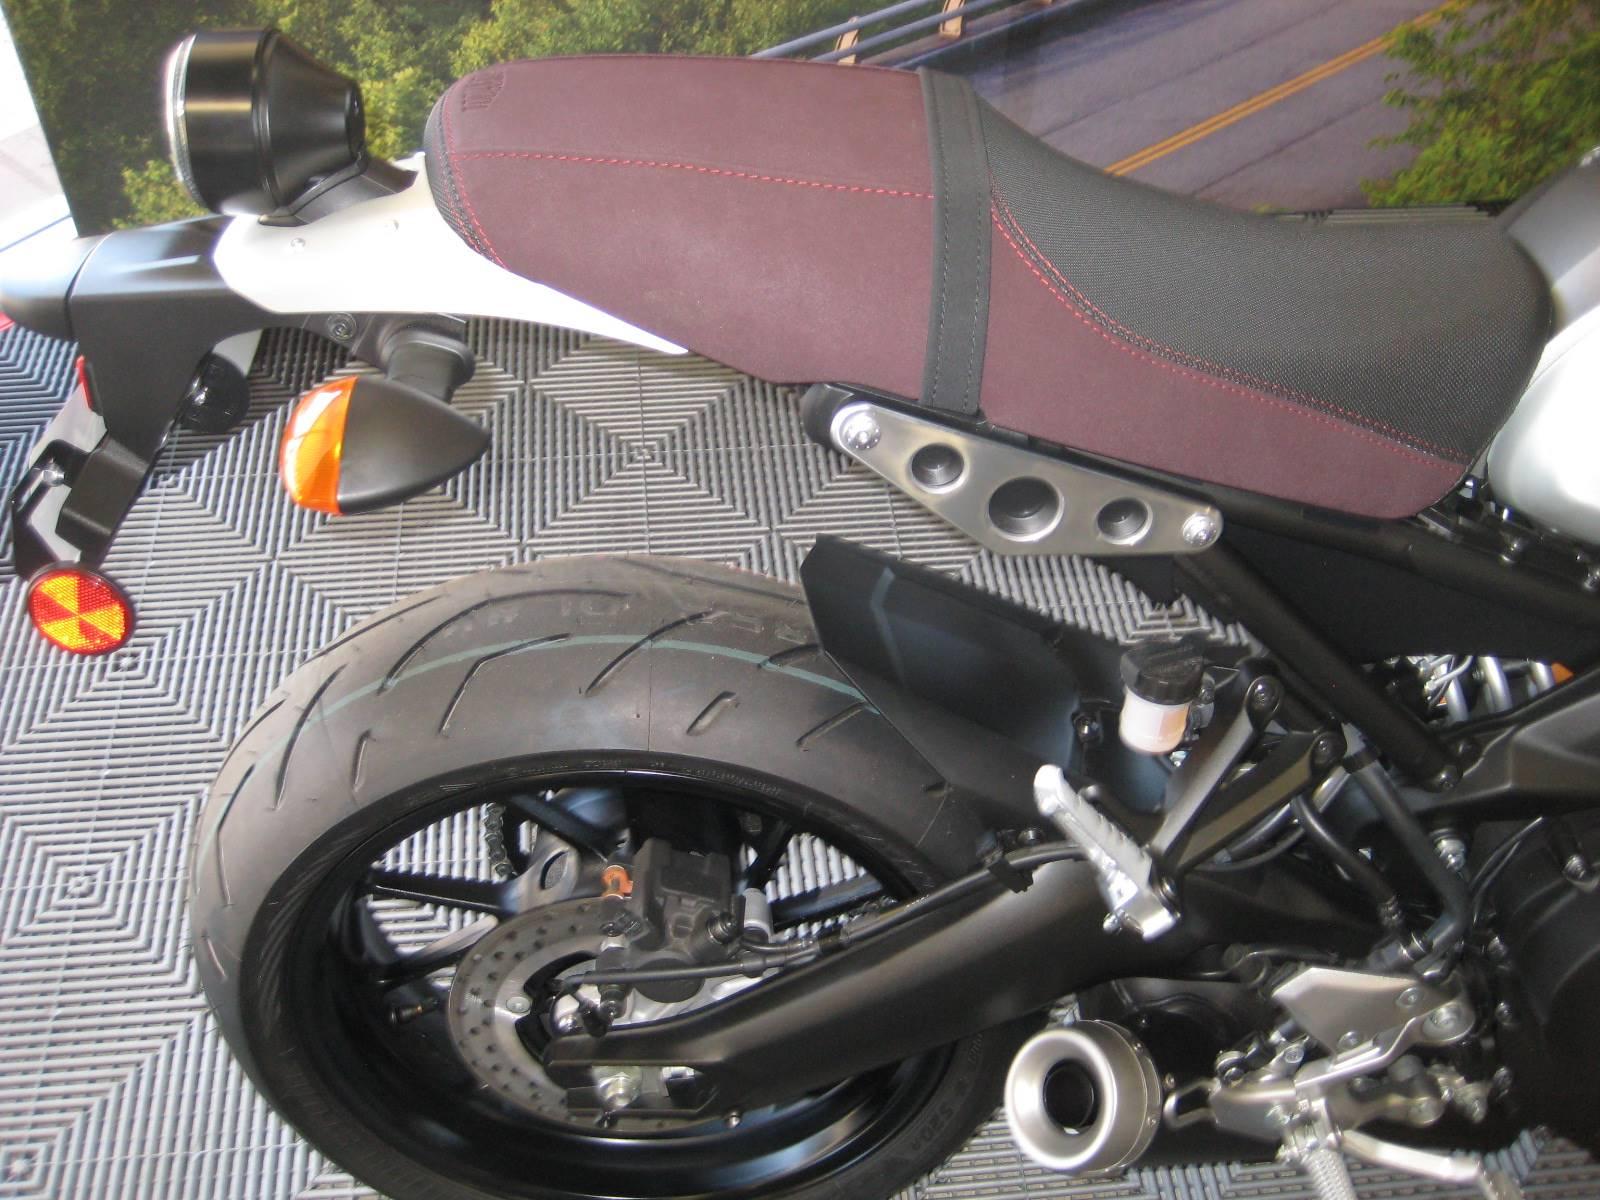 2016 Yamaha XSR900 10